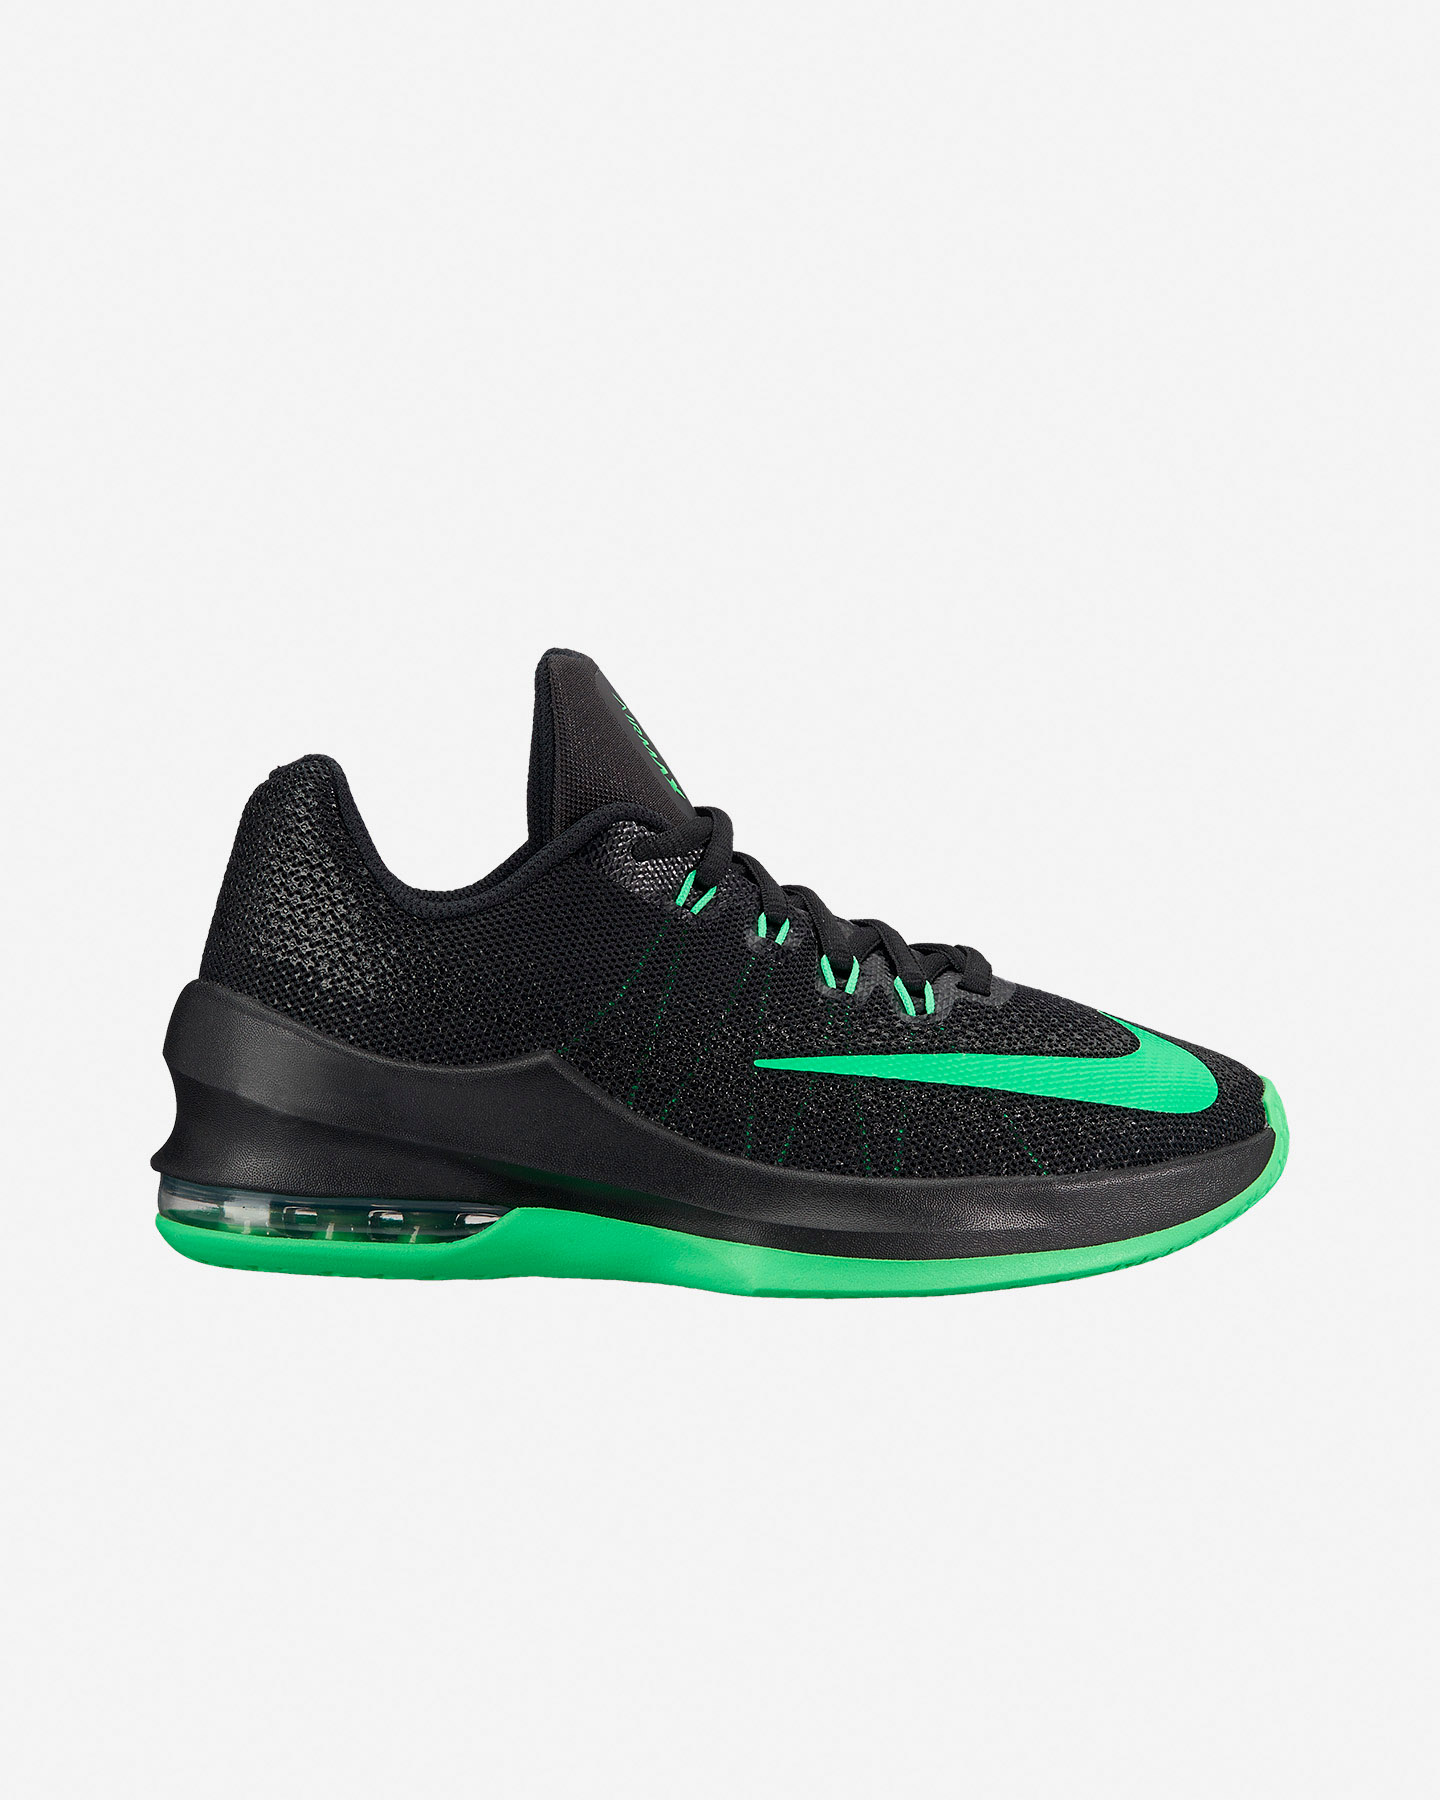 Cisalfa Infuriate Jr Air Su Max Nike Scarpe Basket Sport 869991 q4aRBwSOn a91d2392d16